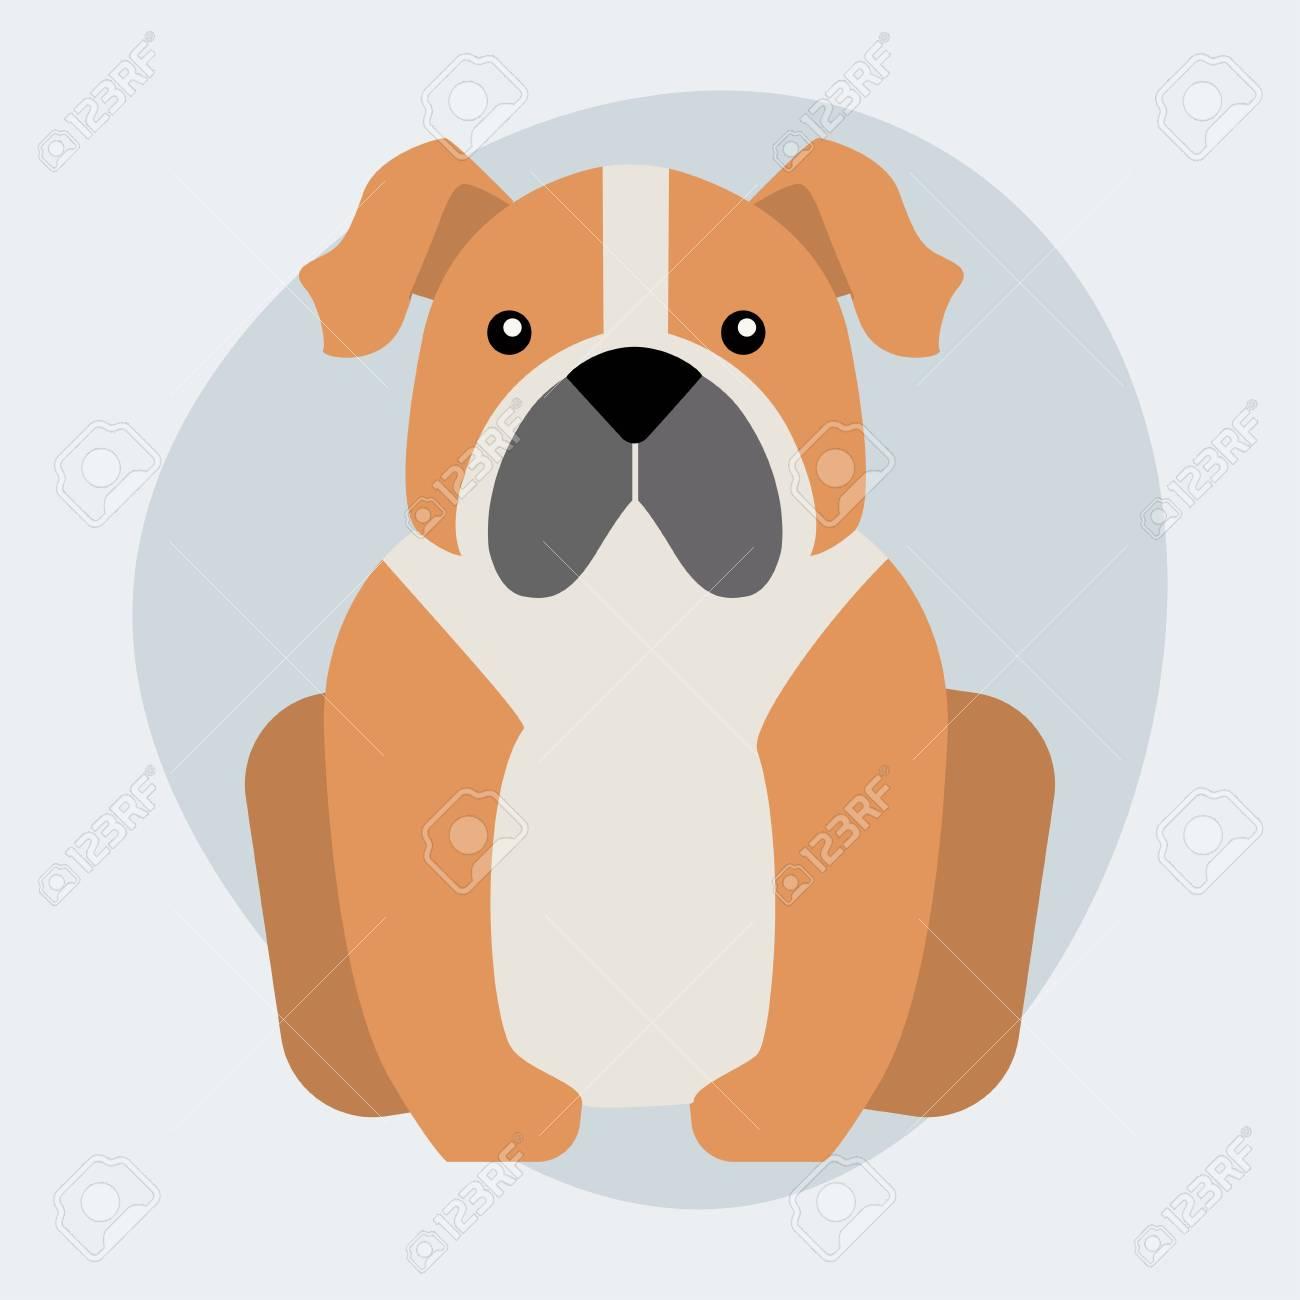 Beautiful Bulldog Canine Adorable Dog - 73935800-funny-cartoon-dog-character-bread-illustration-in-cartoon-style-happy-puppy-and-bulldog-isolated-fri  HD_907121  .jpg